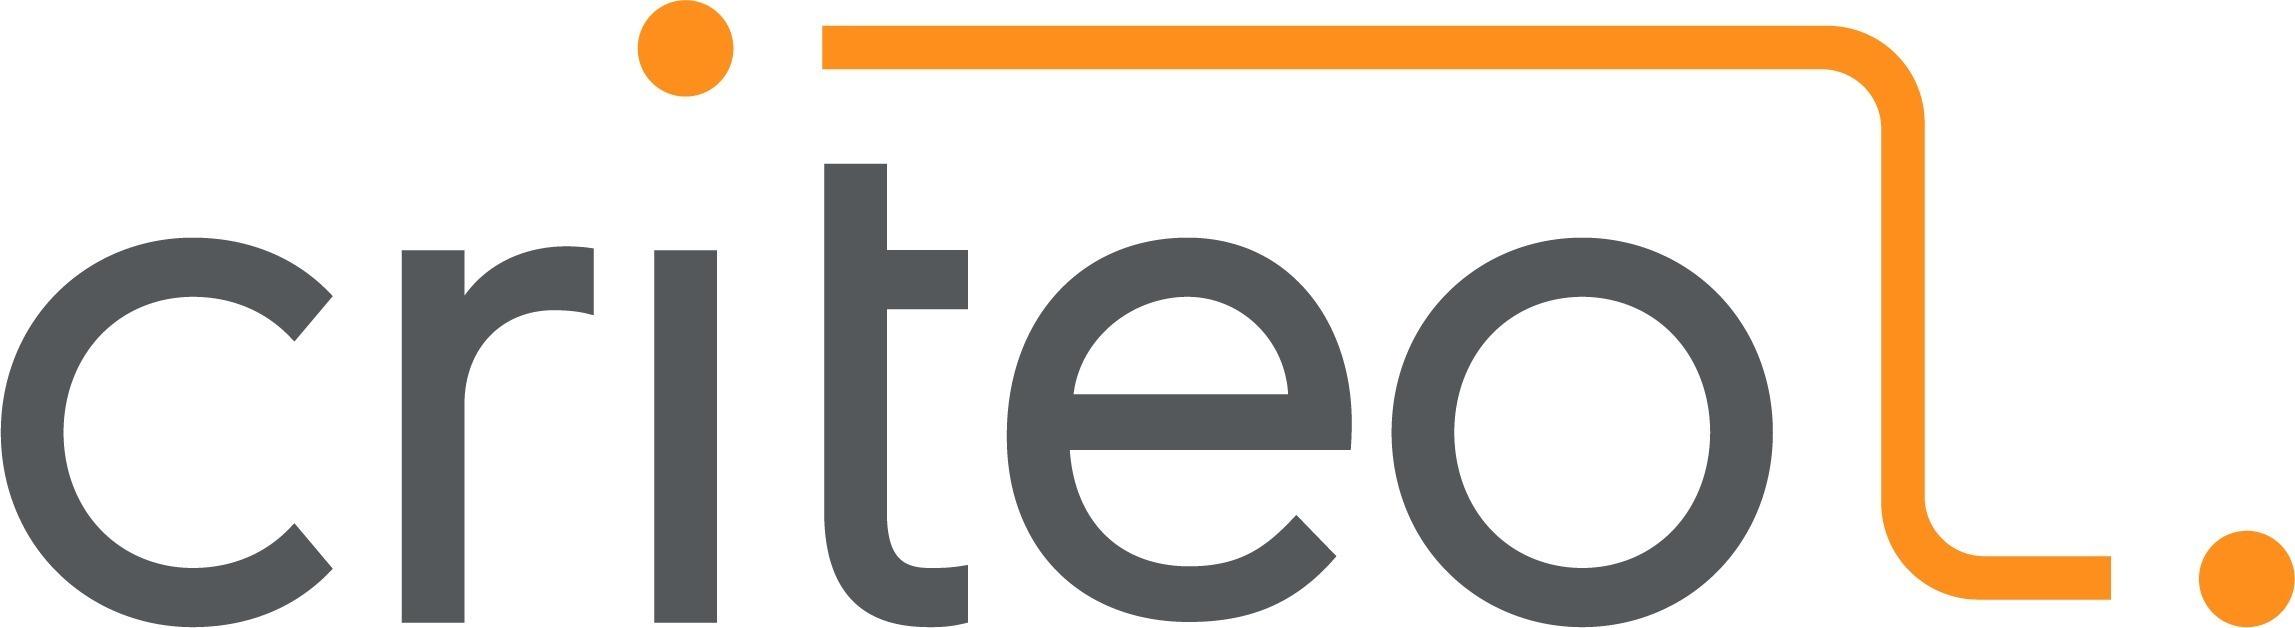 Criteo logo.